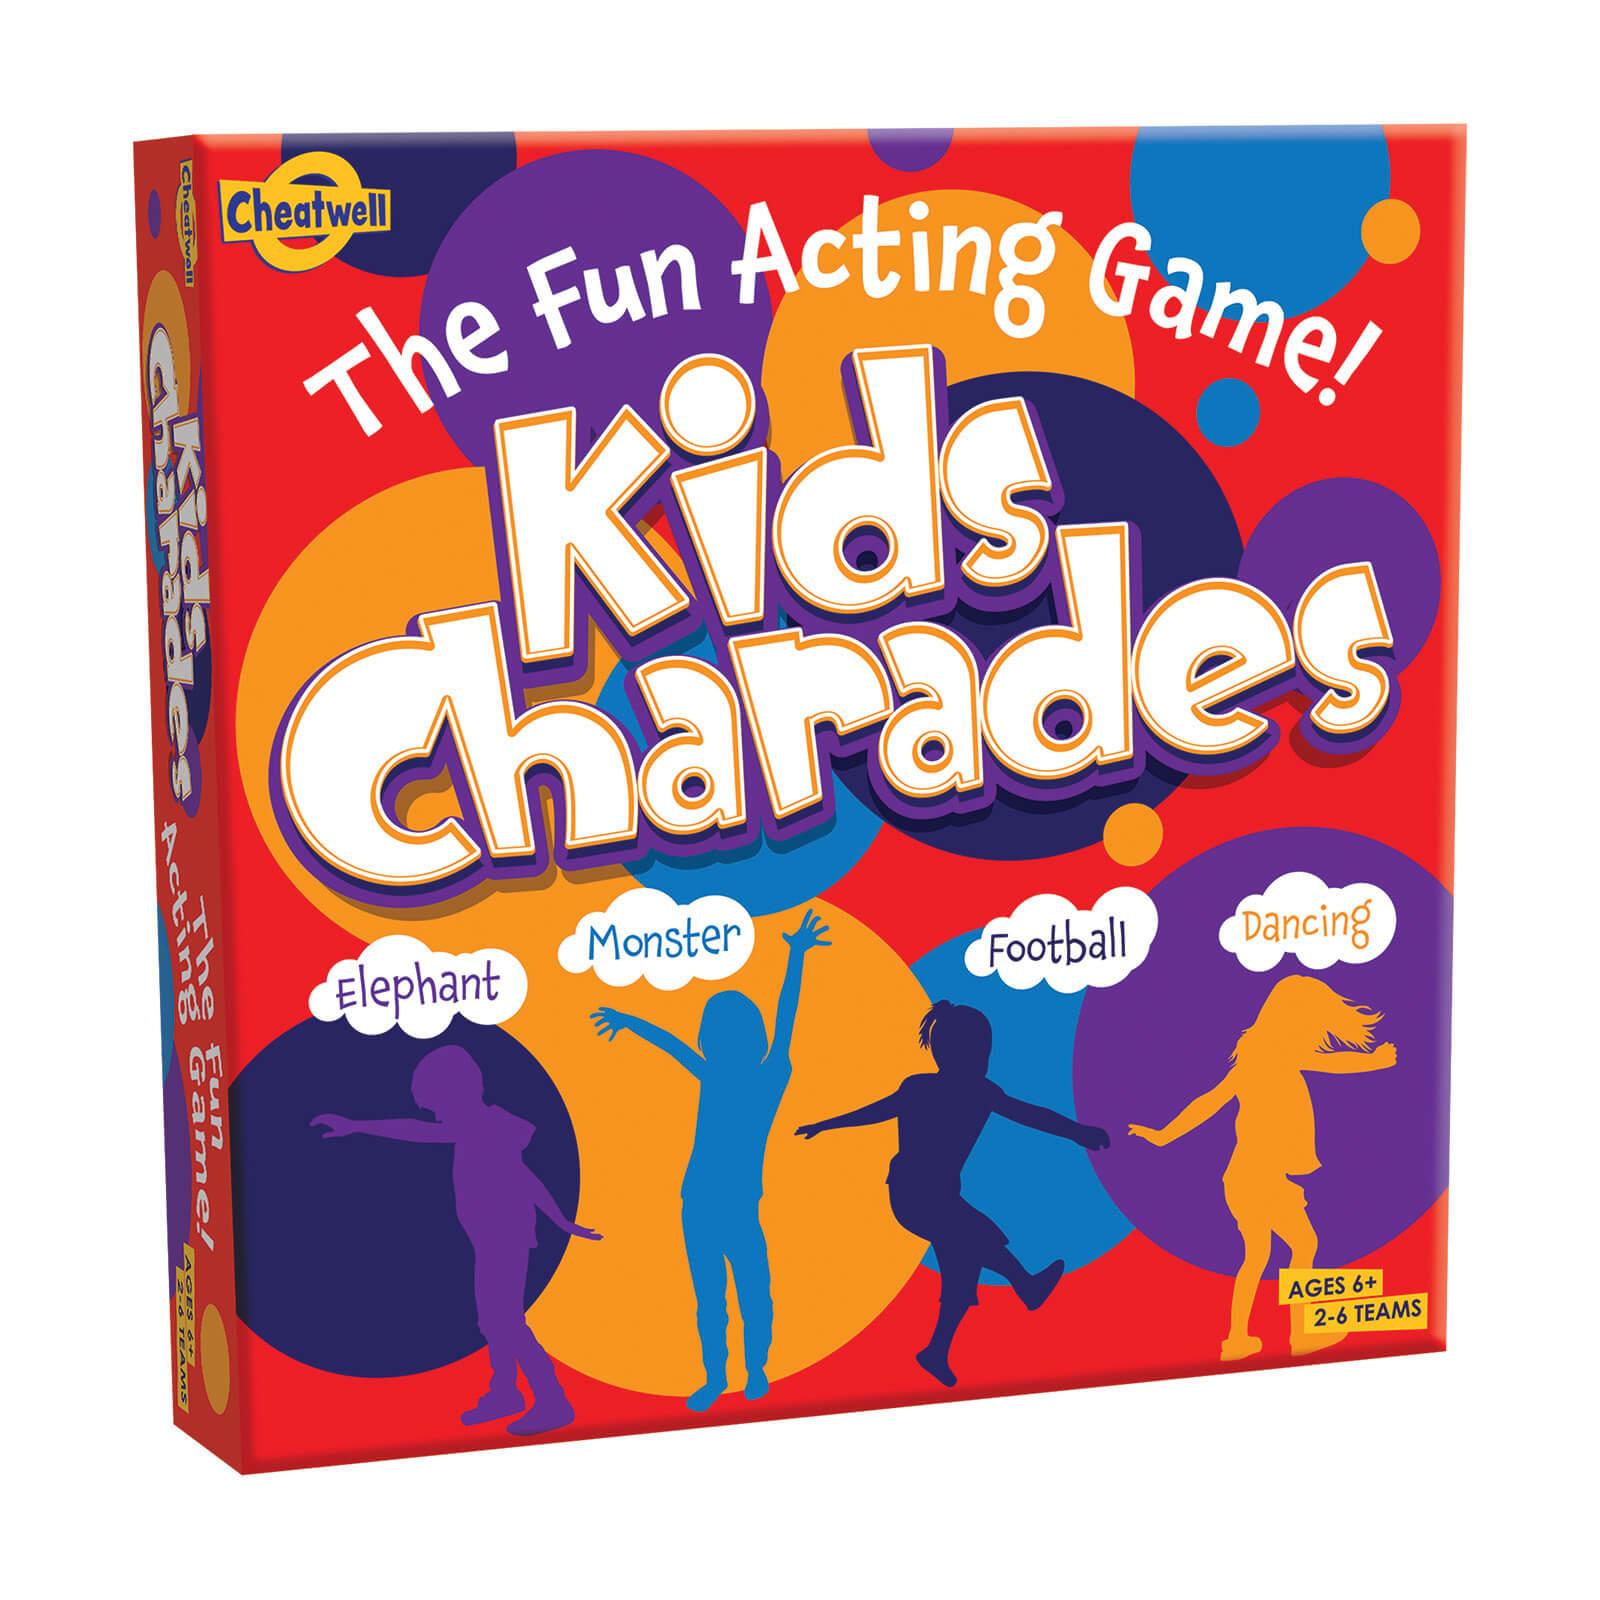 Image of Kids' Charades